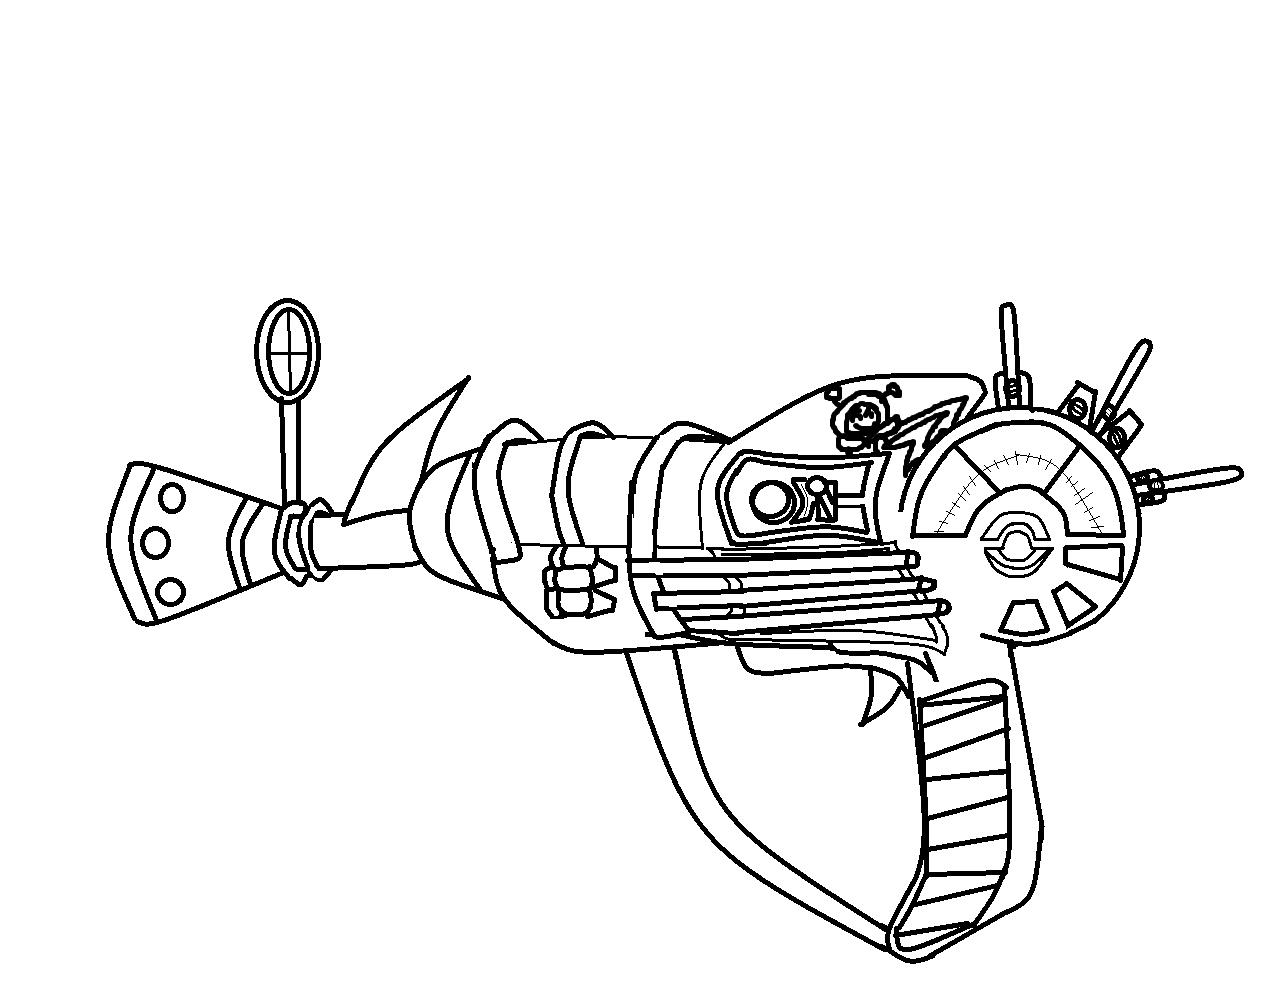 Ray Gun by GokuAndSonic on DeviantArt